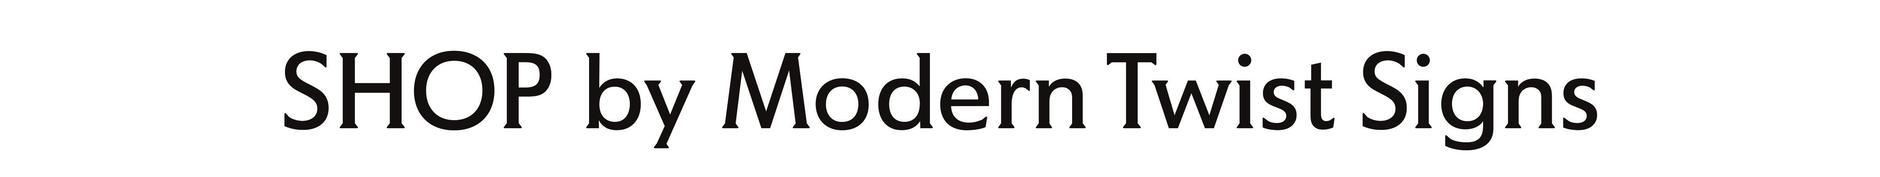 SHOP by Modern Twist Signs